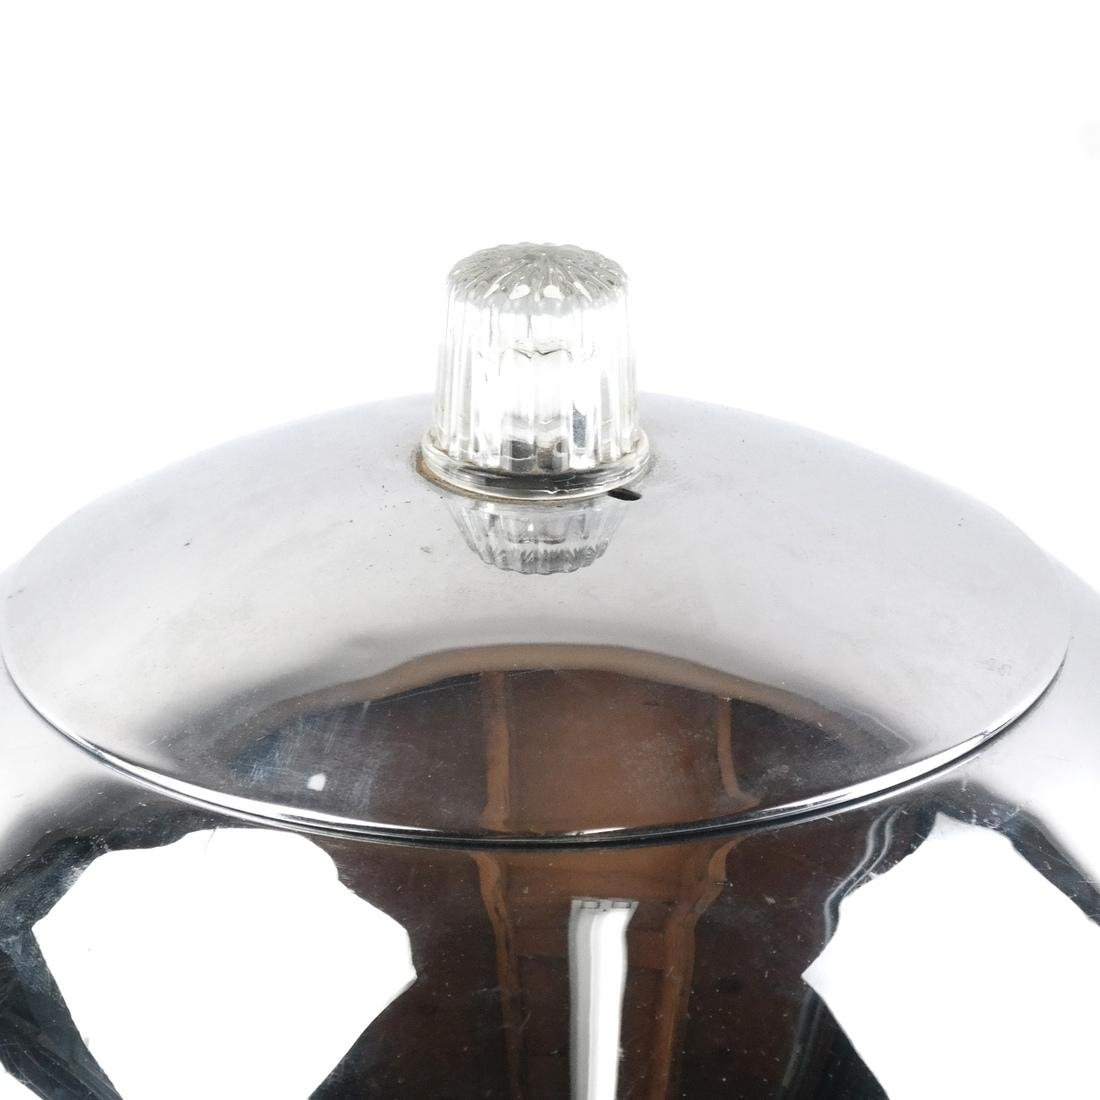 20th C. Modern Coffee Pot Chase USA - 2